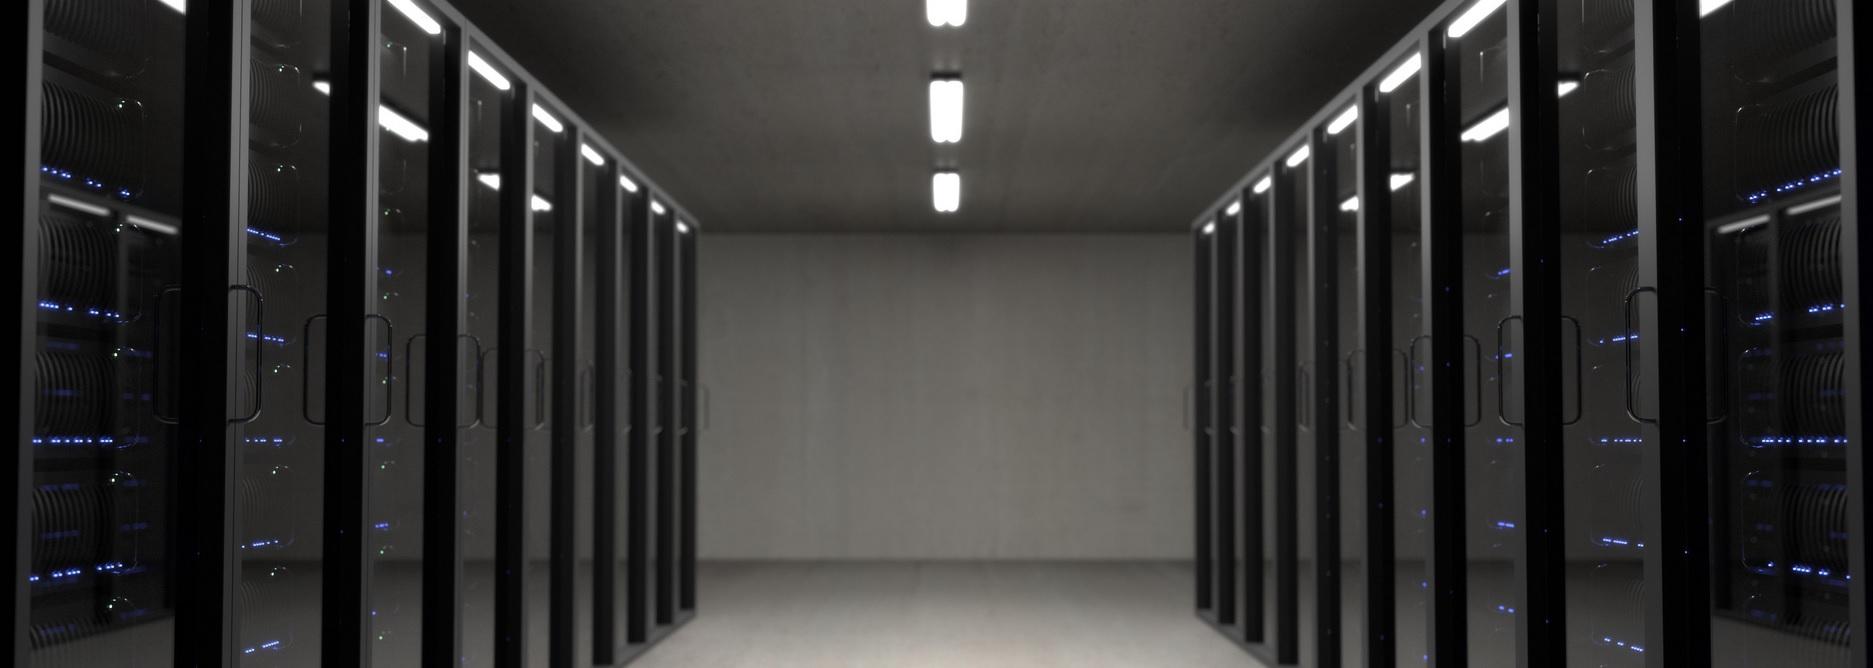 Server - sicurezza informatica